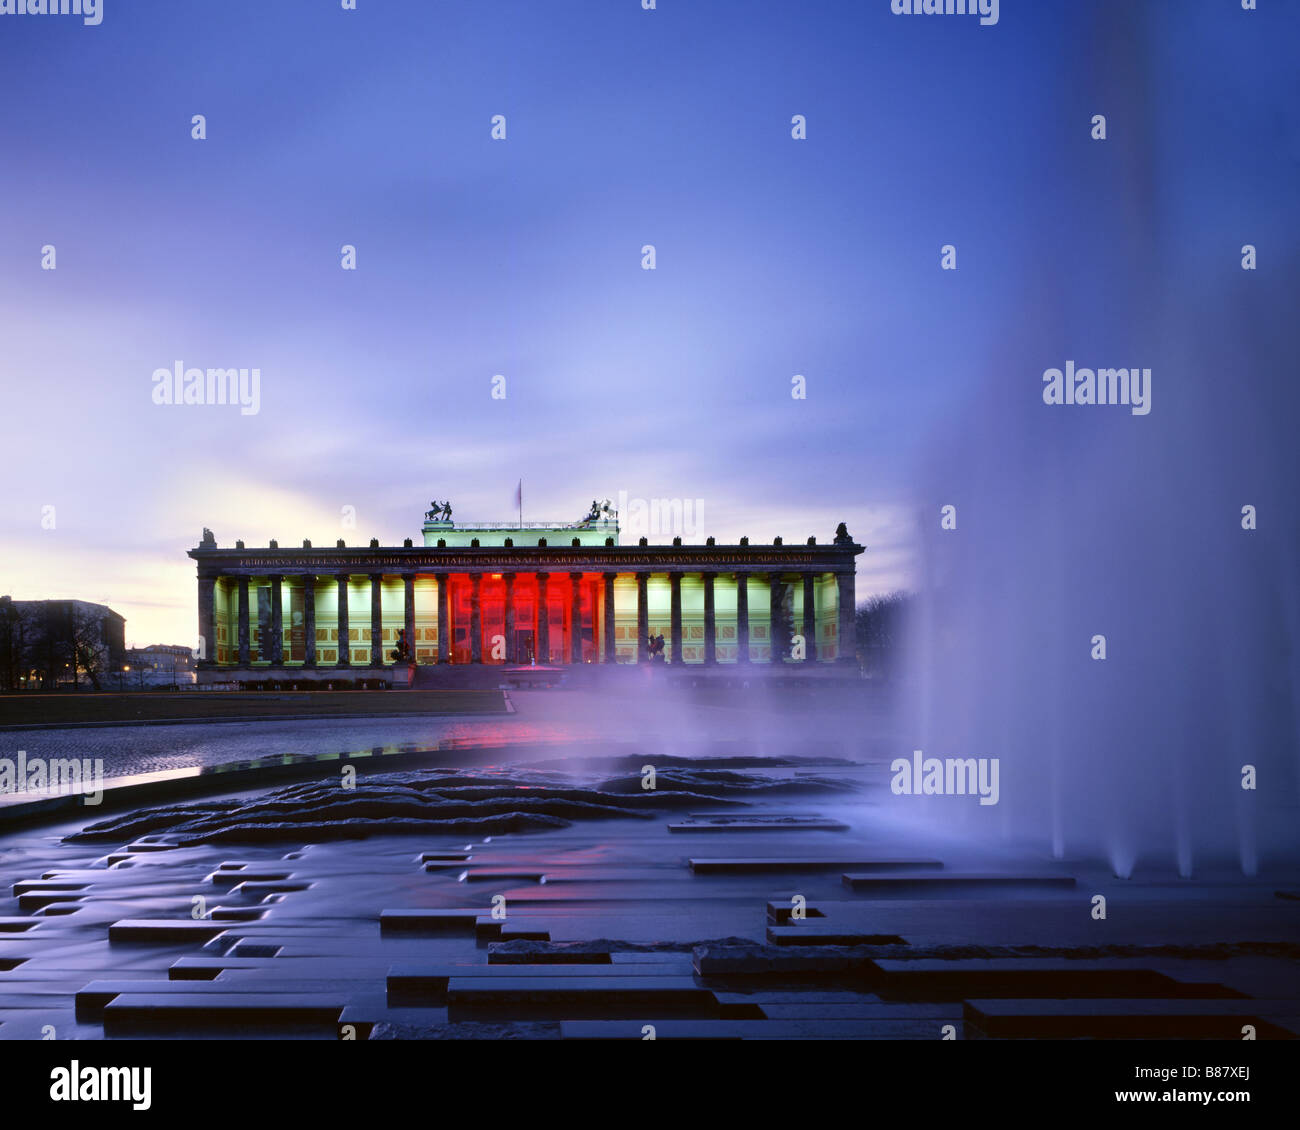 Old museum Berlin Museum island Classicism - Stock Image